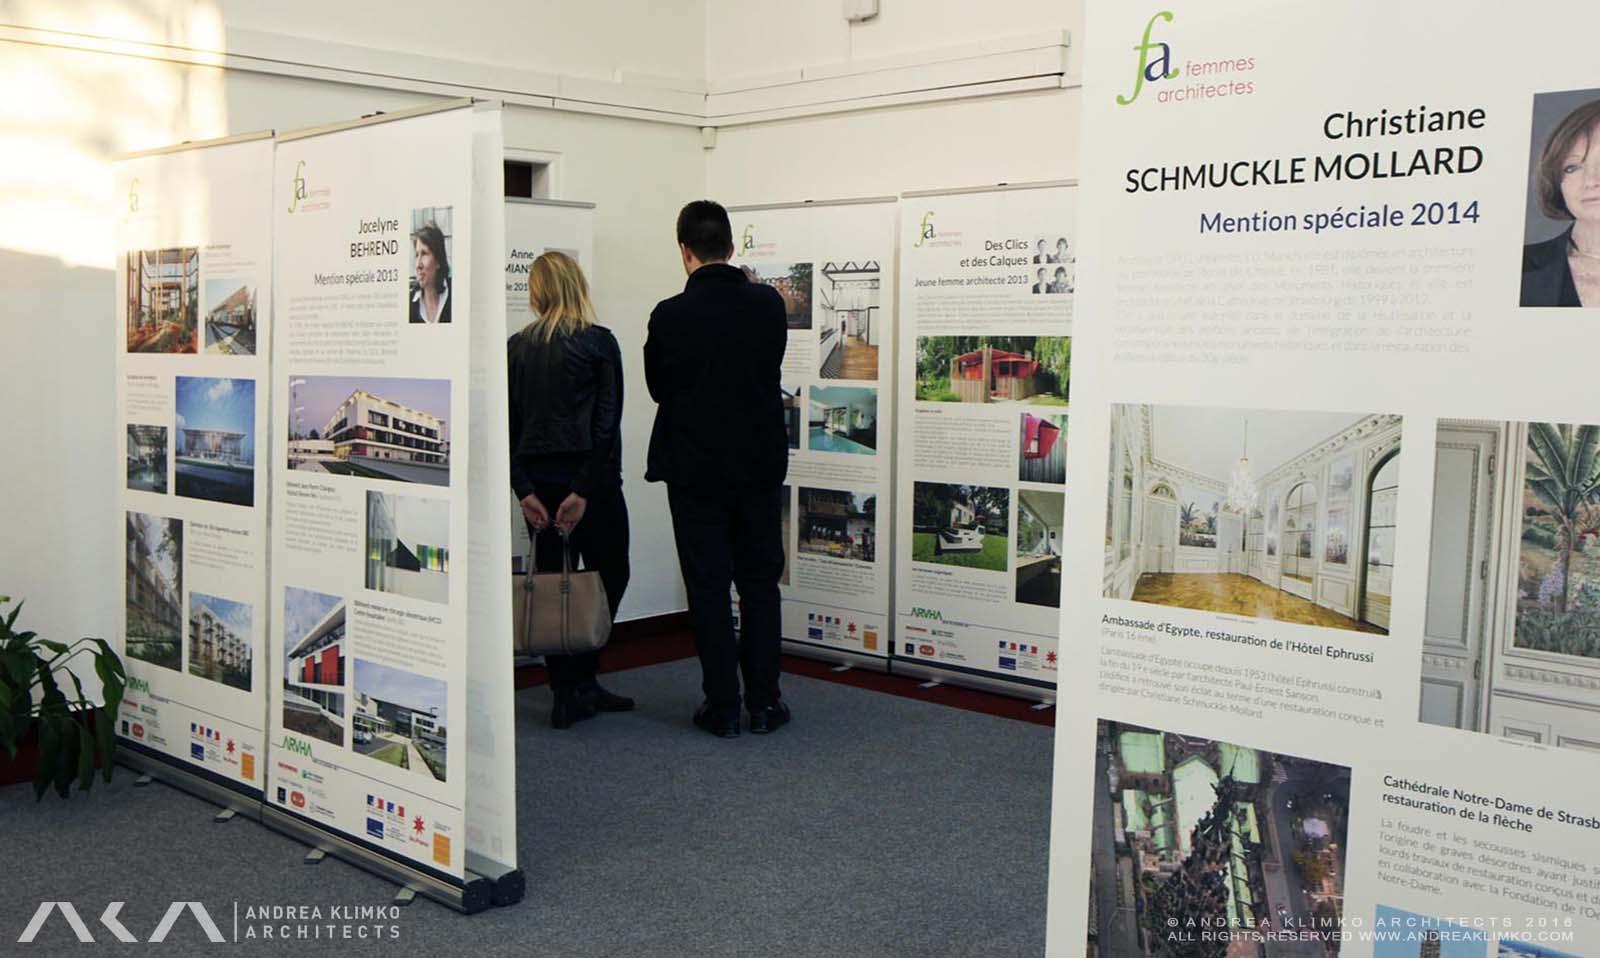 prix-des-femmes-architectes-on-display-in-bratislava_01